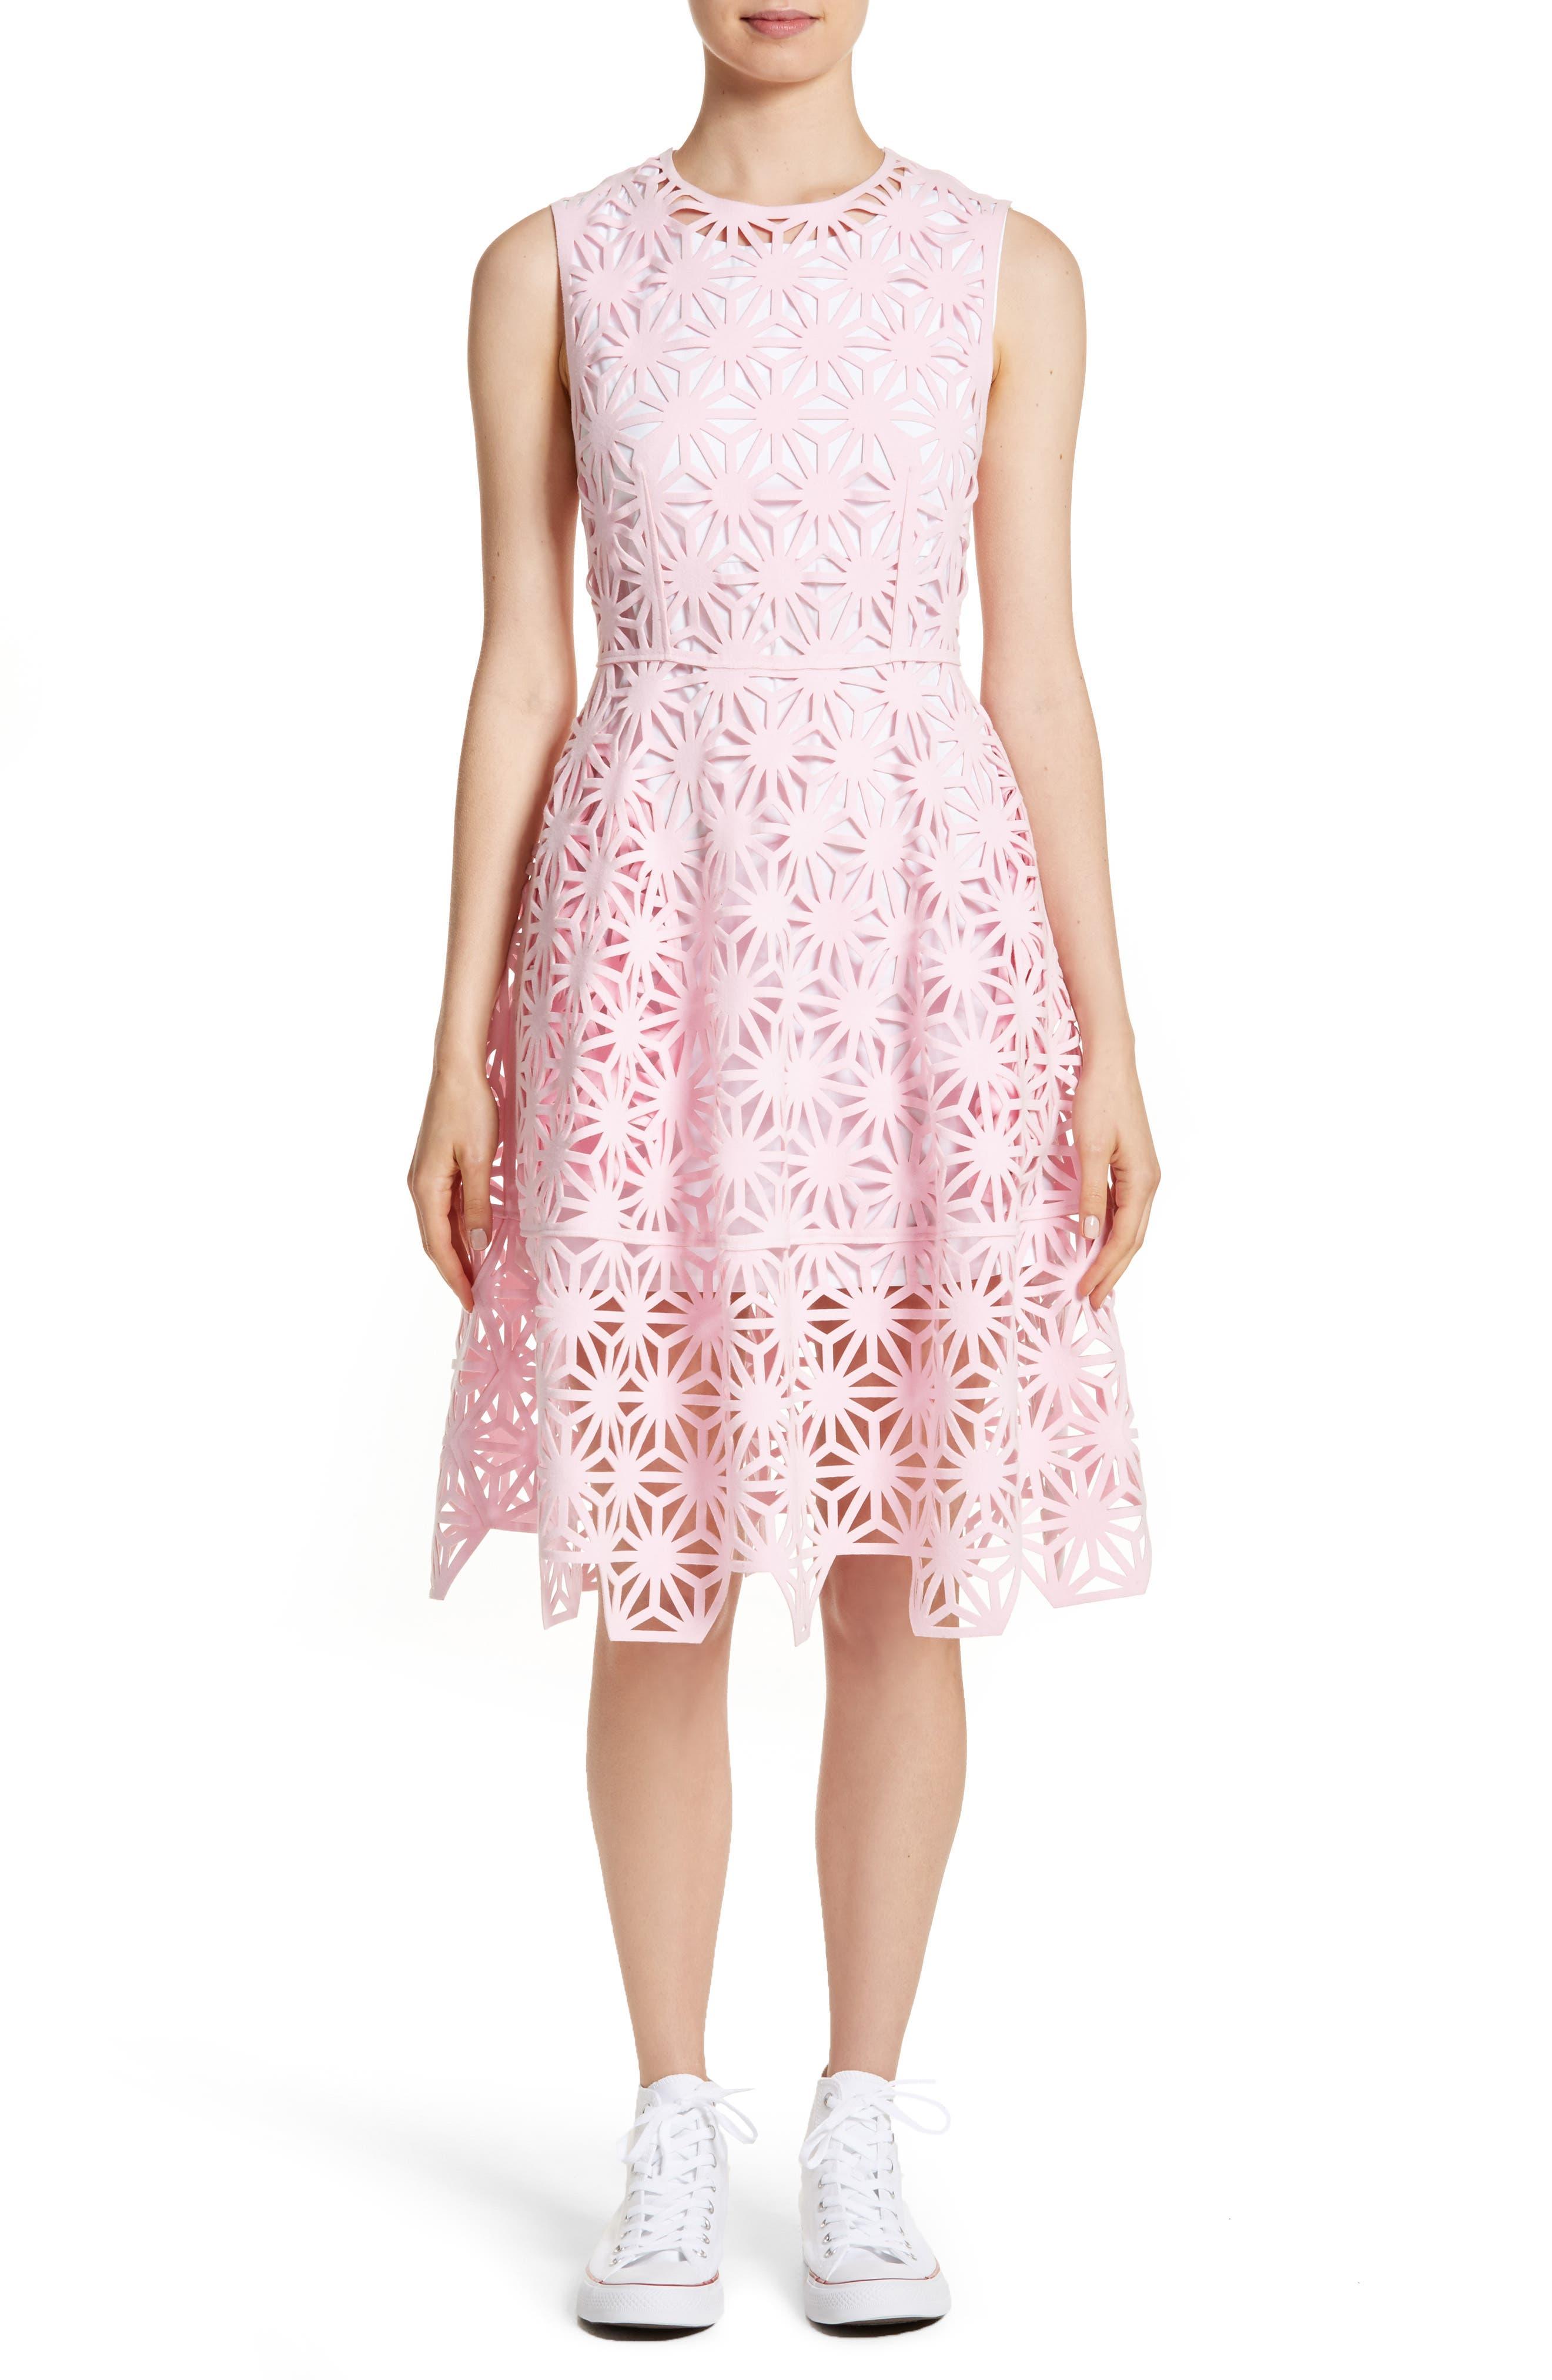 Alternate Image 1 Selected - PASKAL Geo Laser Cut Fit & Flare Dress